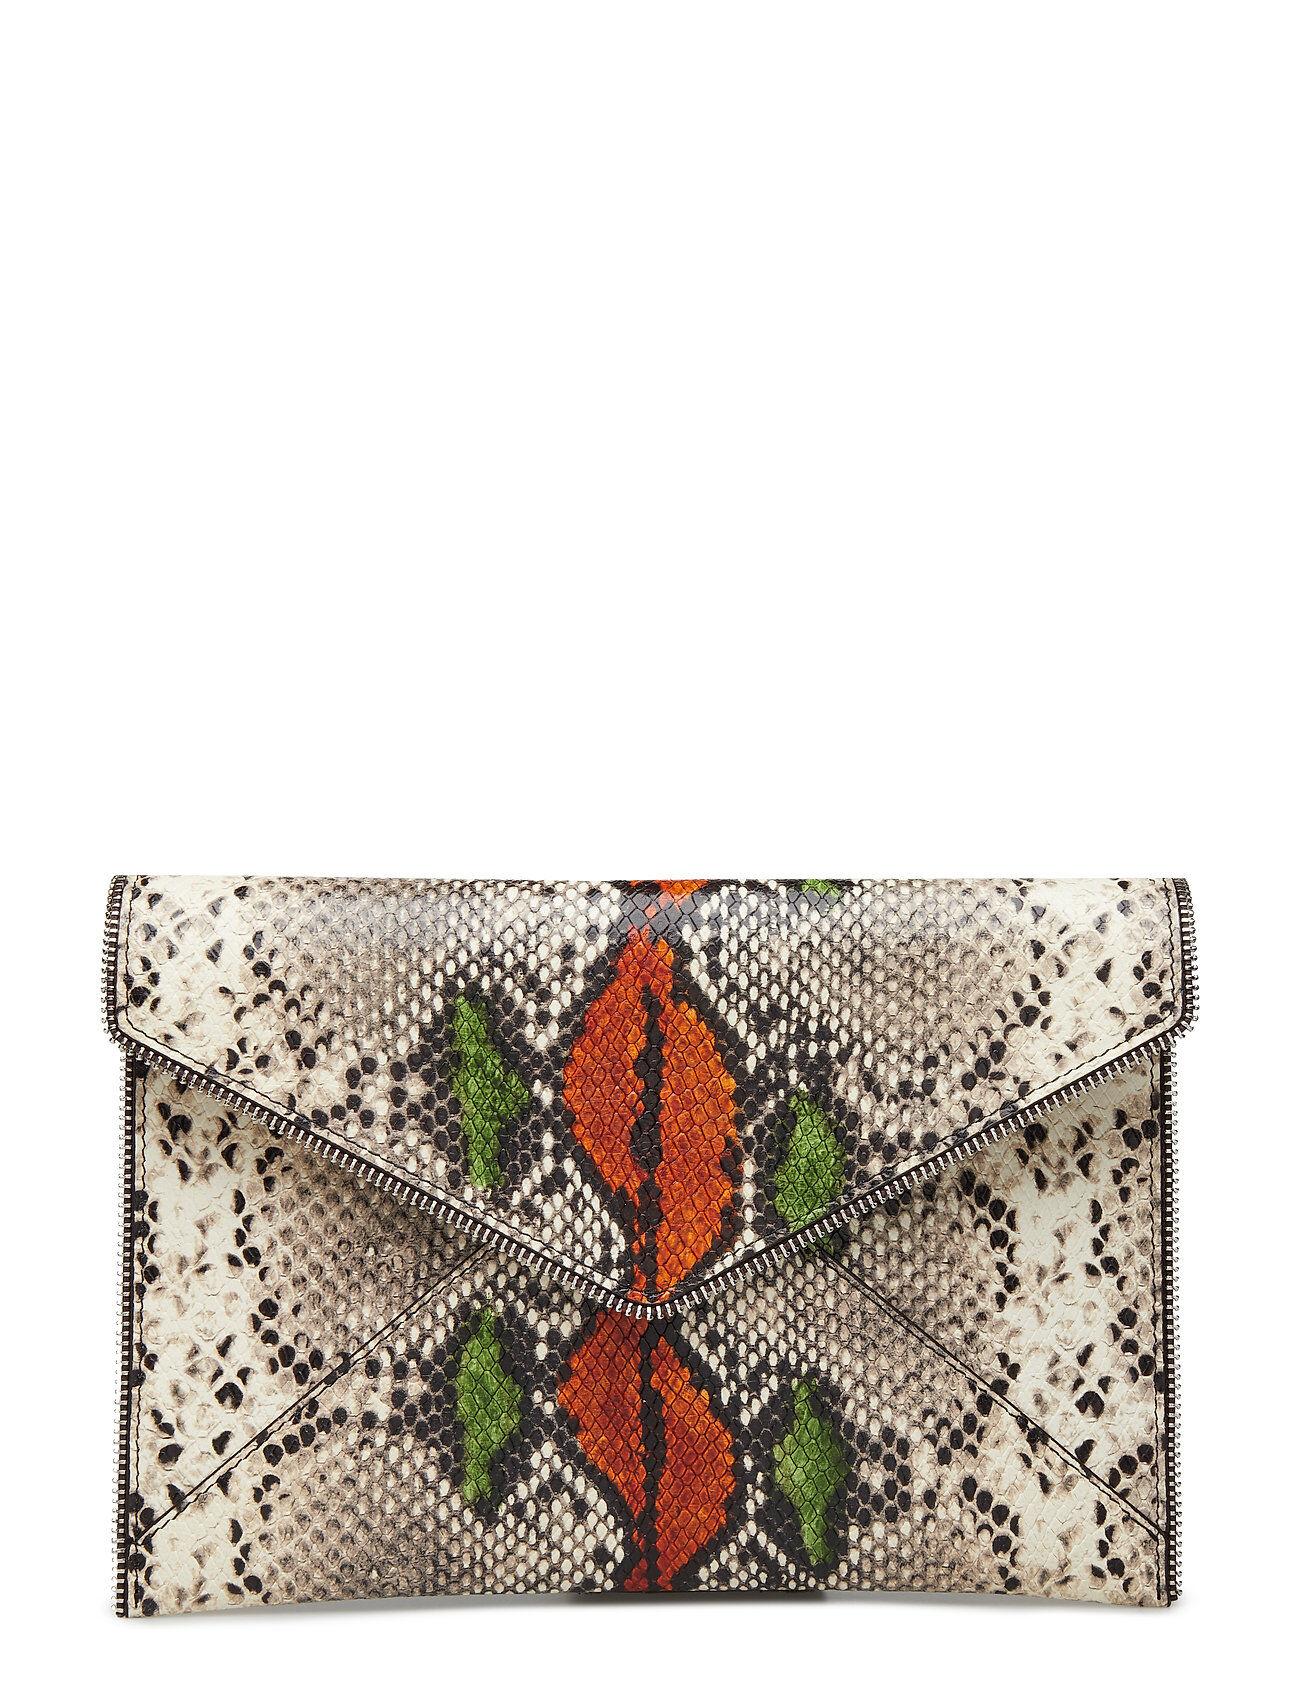 Rebecca Minkoff Graphic Embossed Snake